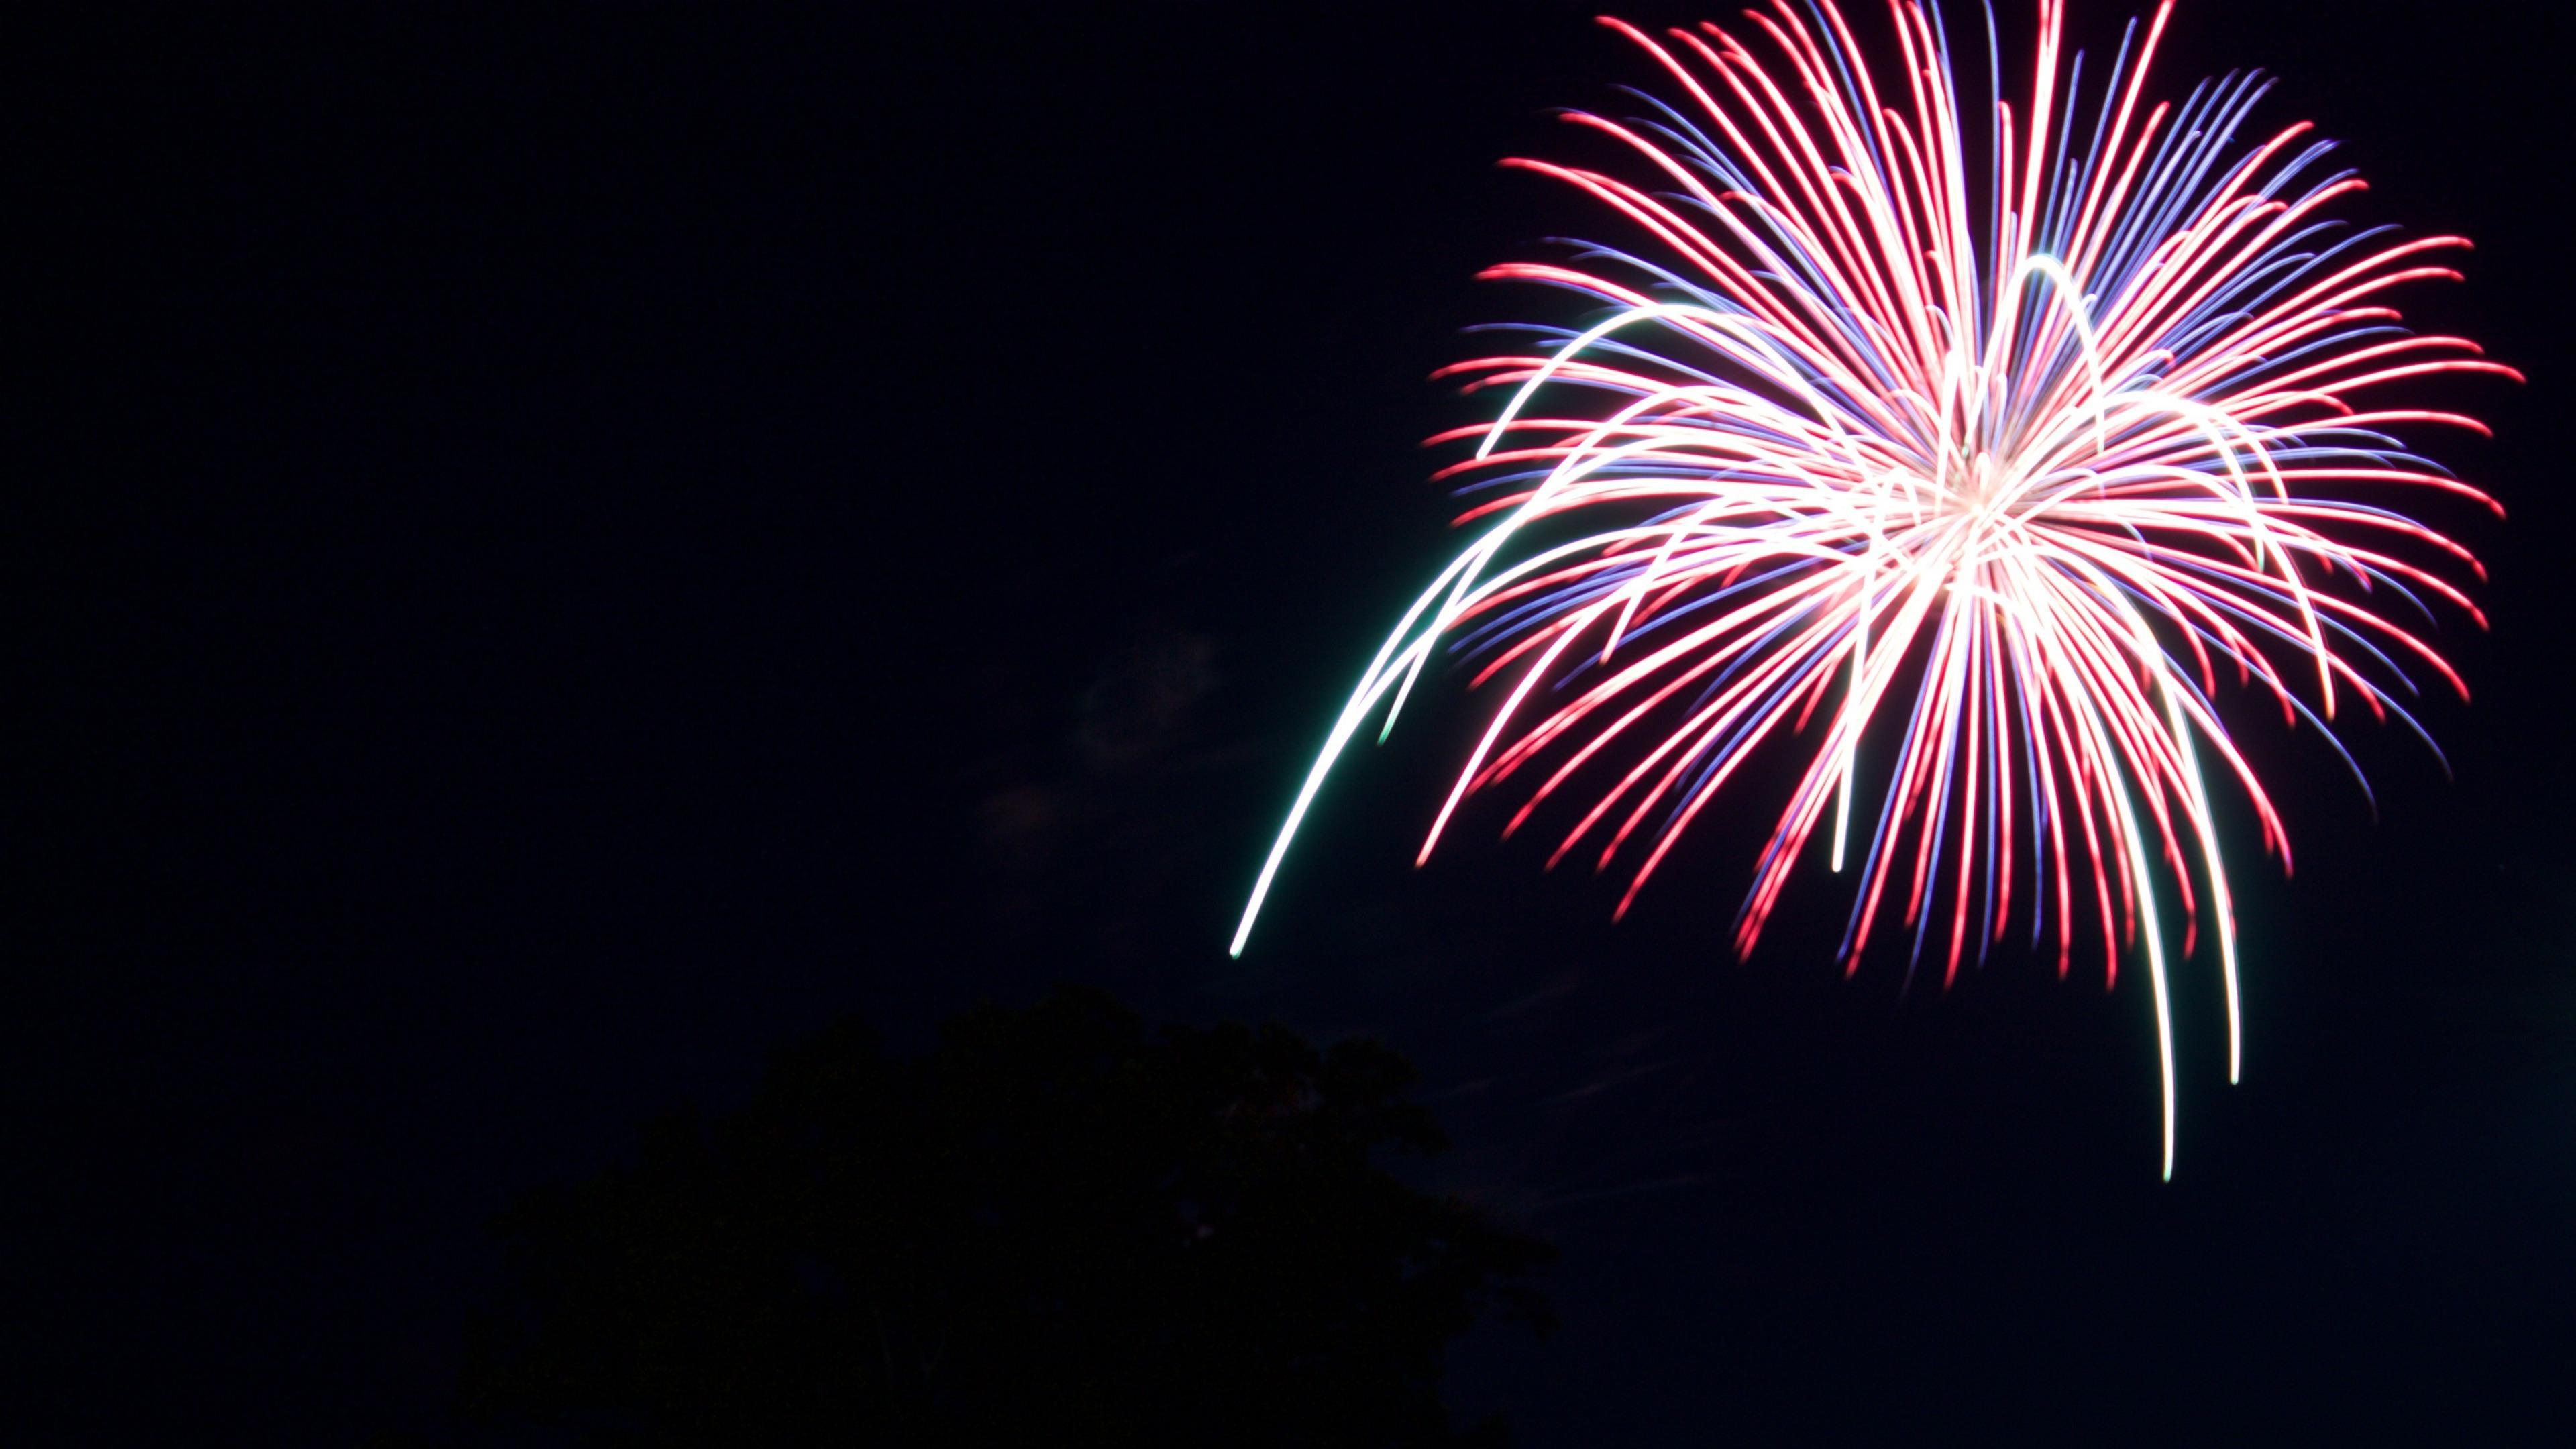 Firework on July 4 wallpaper